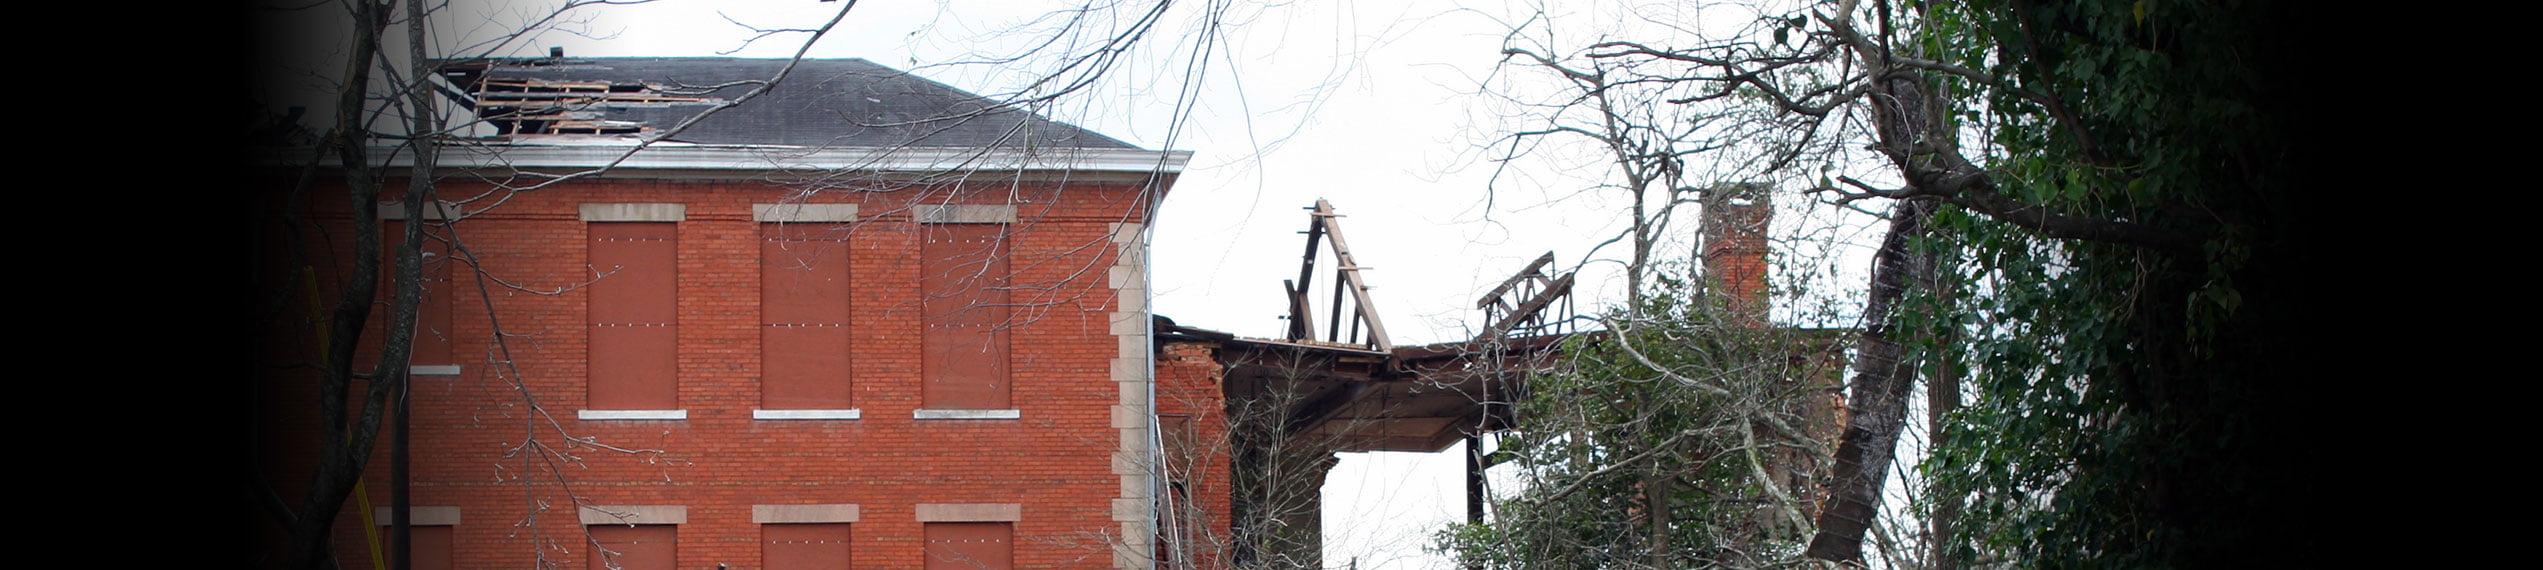 Wind & Storm Damage Repairs in Paul Davis Restoration of Morris and Passaic Counties NJ